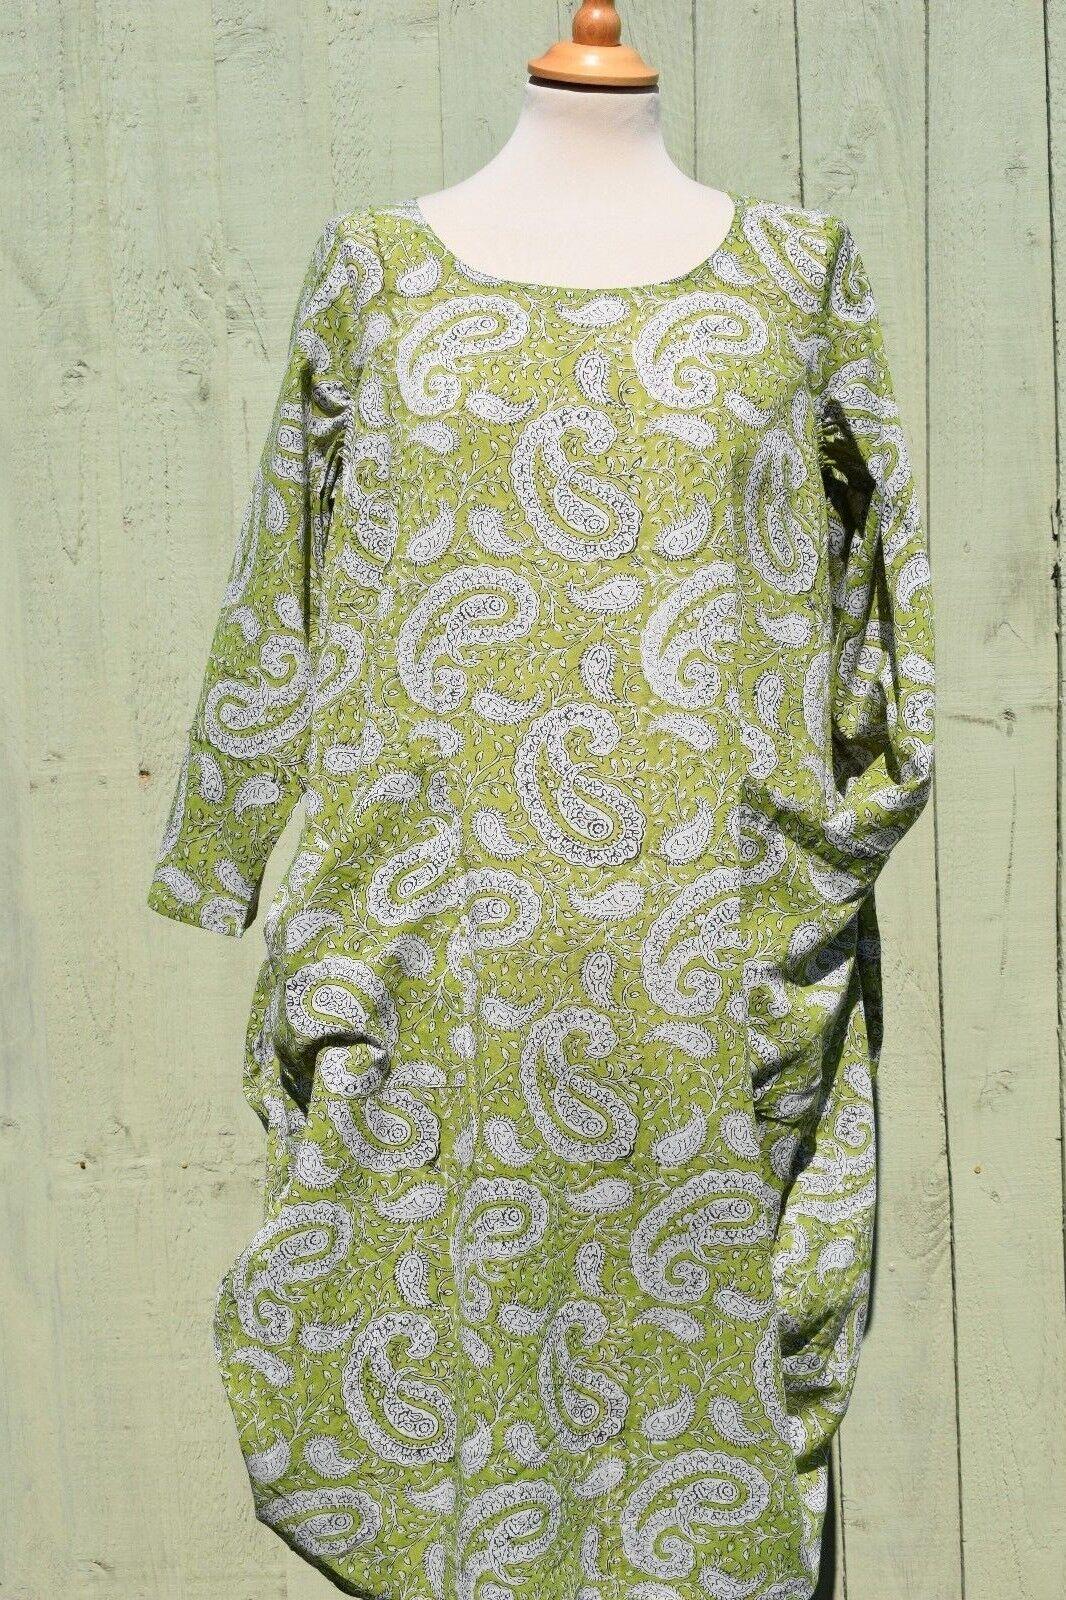 Nila Rubia Light Cotton Grün Paisley Roshan Tunic Dress Pockets 3 4 Sleeve